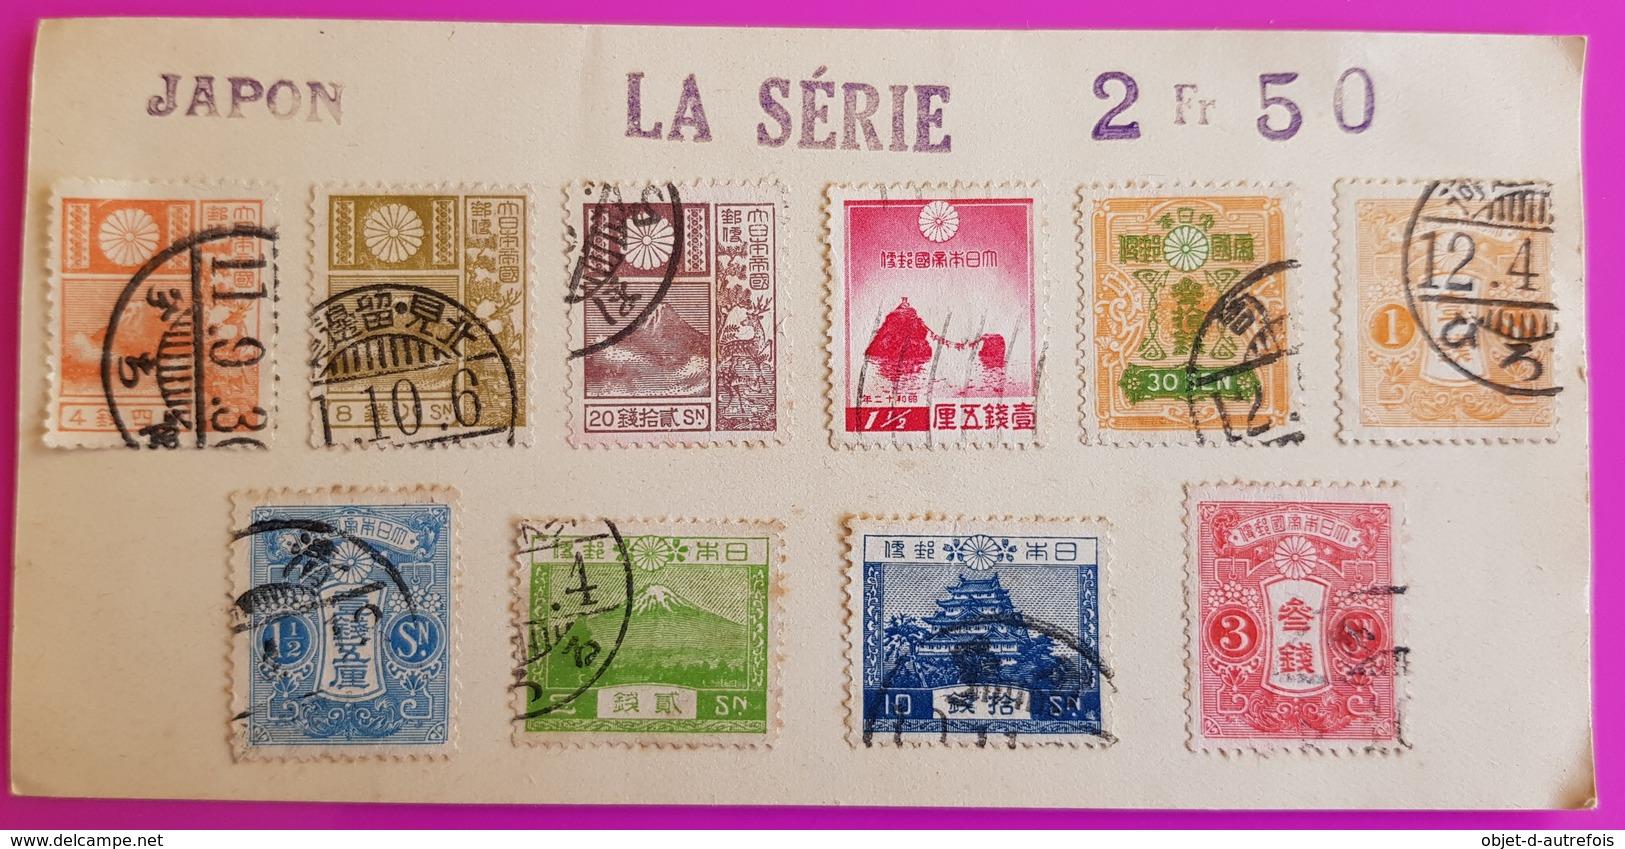 Série De Timbres Du Japon Timbre Japonais / Japan Stamp Series Japanese / 日本スタンプシリーズ日本語スタンプ - Japon